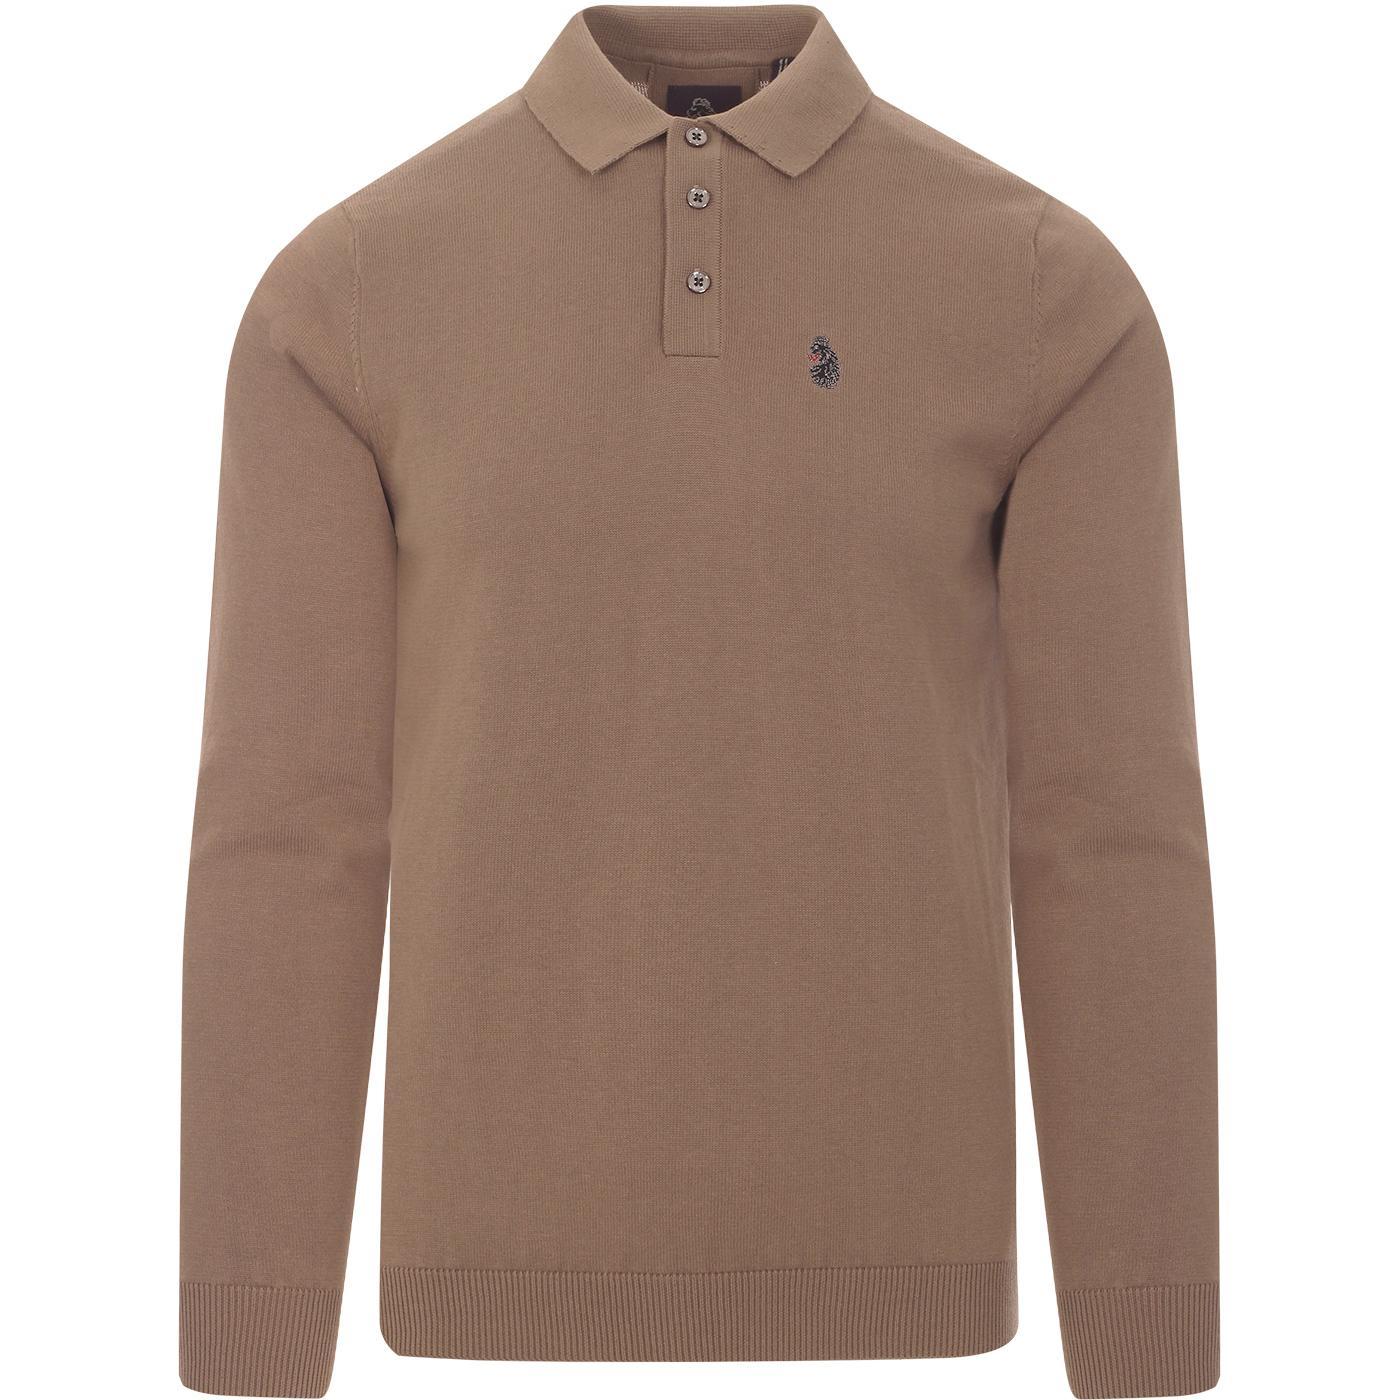 Magnesium LUKE Retro Mod Fine Knit Polo Shirt (F)